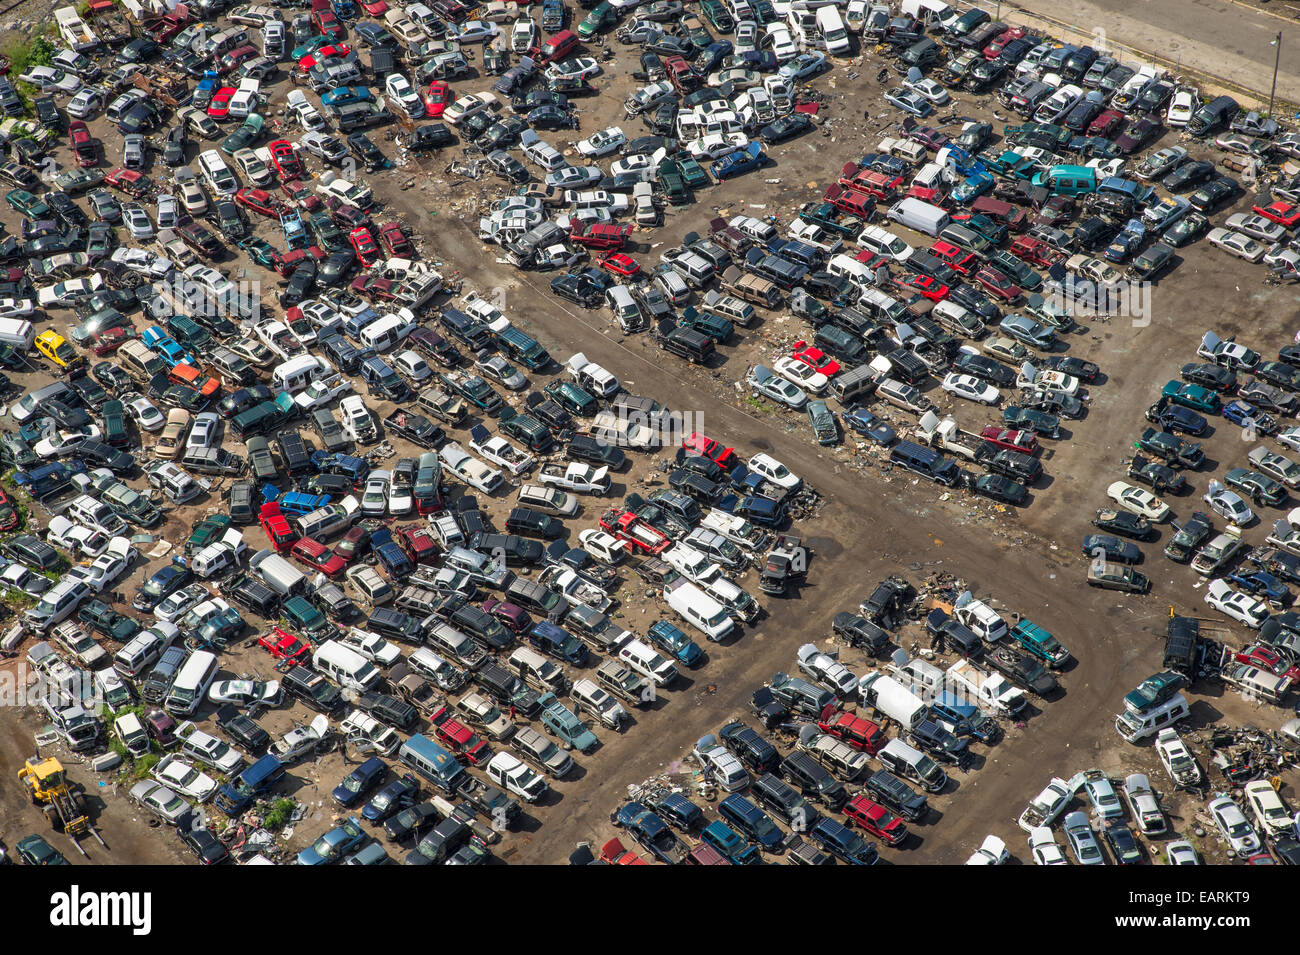 Auto Junkyard Aerial View Stock Photo 75508505 Alamy